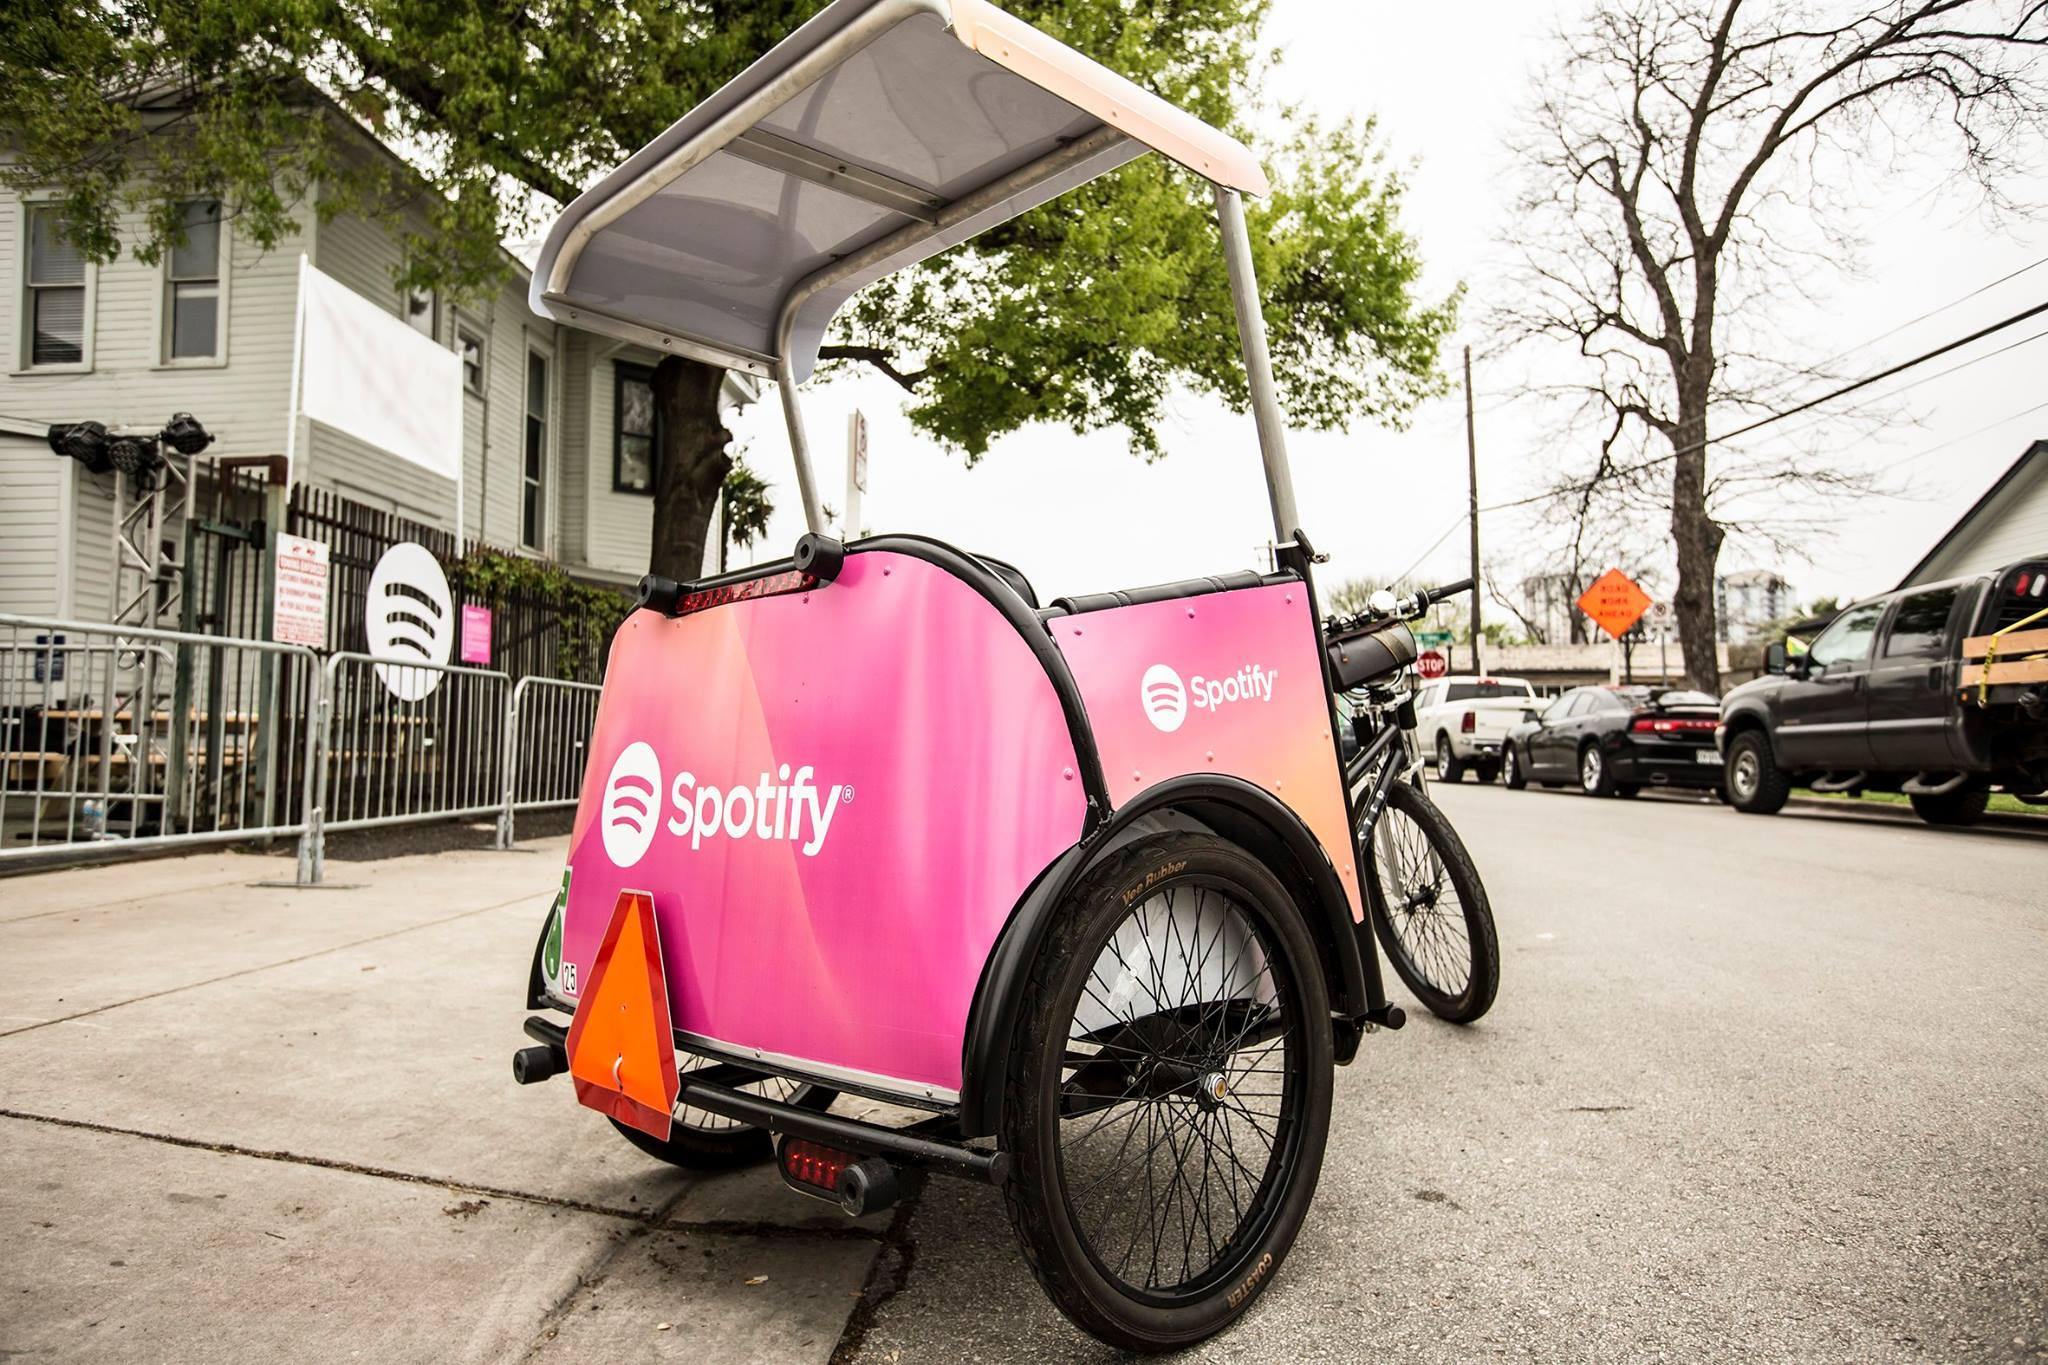 A Spotify branded pedicab.